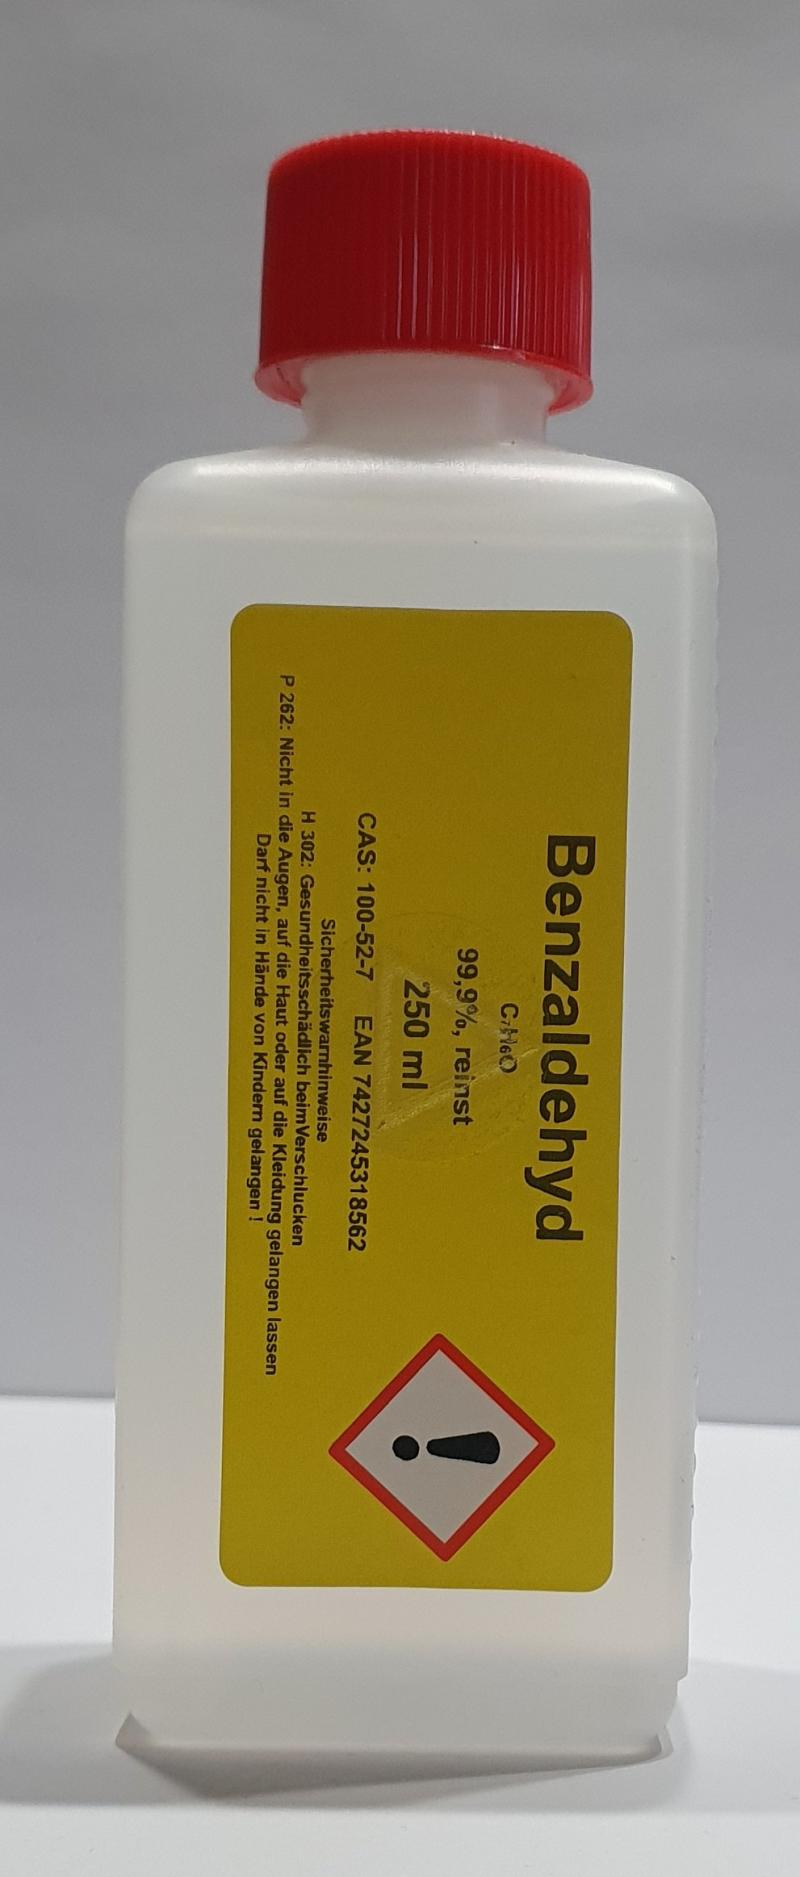 250 ml Benzaldehyd Benzaldehyde 99,9% Bitter Mandel Aroma